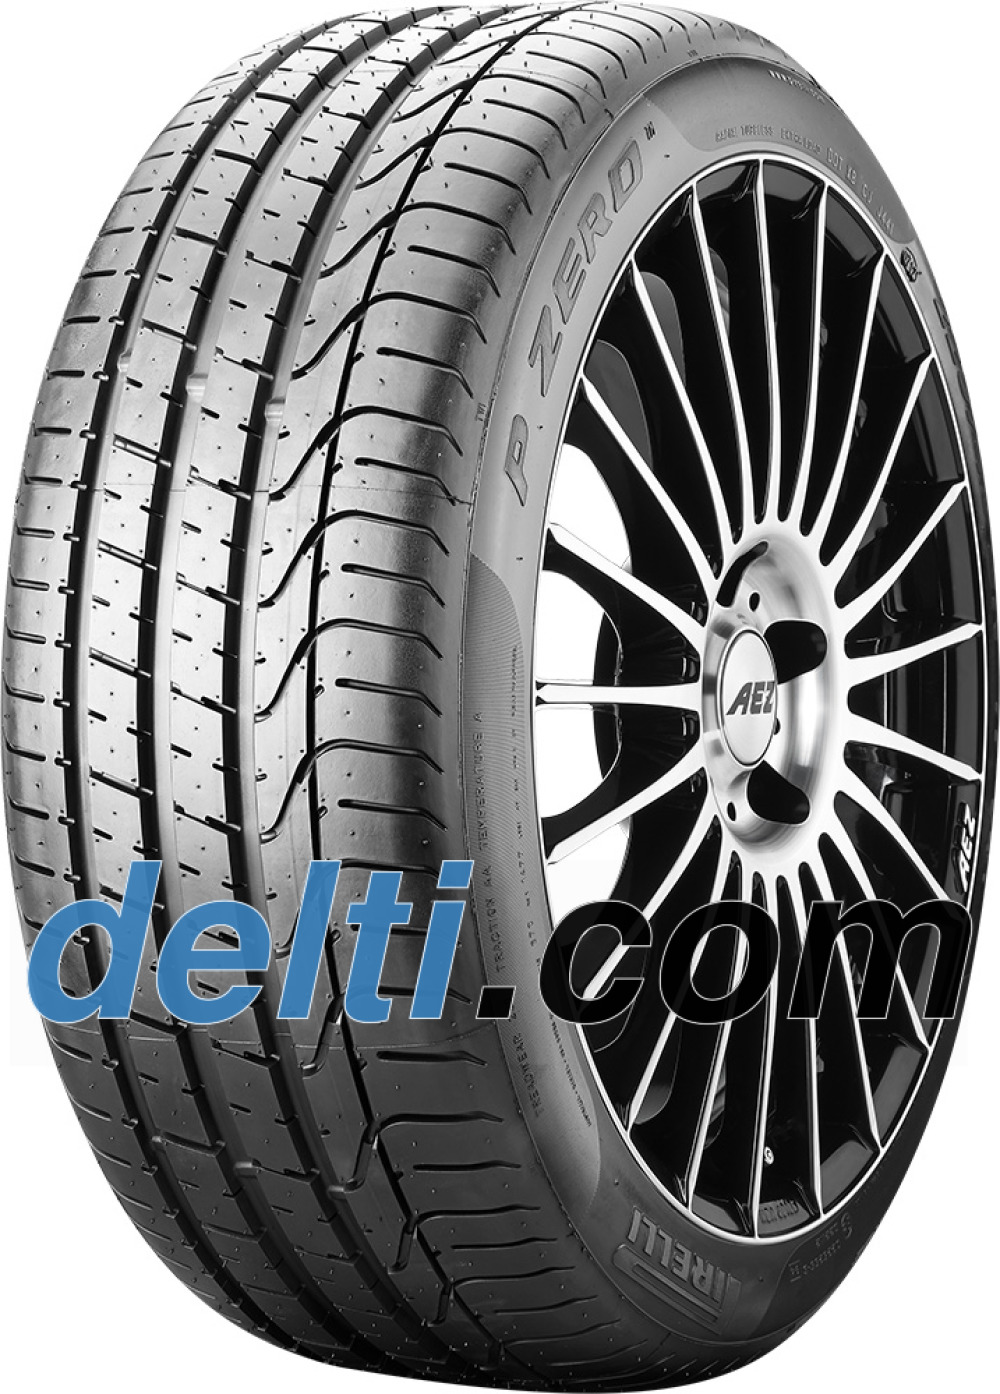 Pirelli P Zero ( 285/30 ZR21 (100Y) XL PNCS, RO1, med felgbeskyttelse (MFS) )